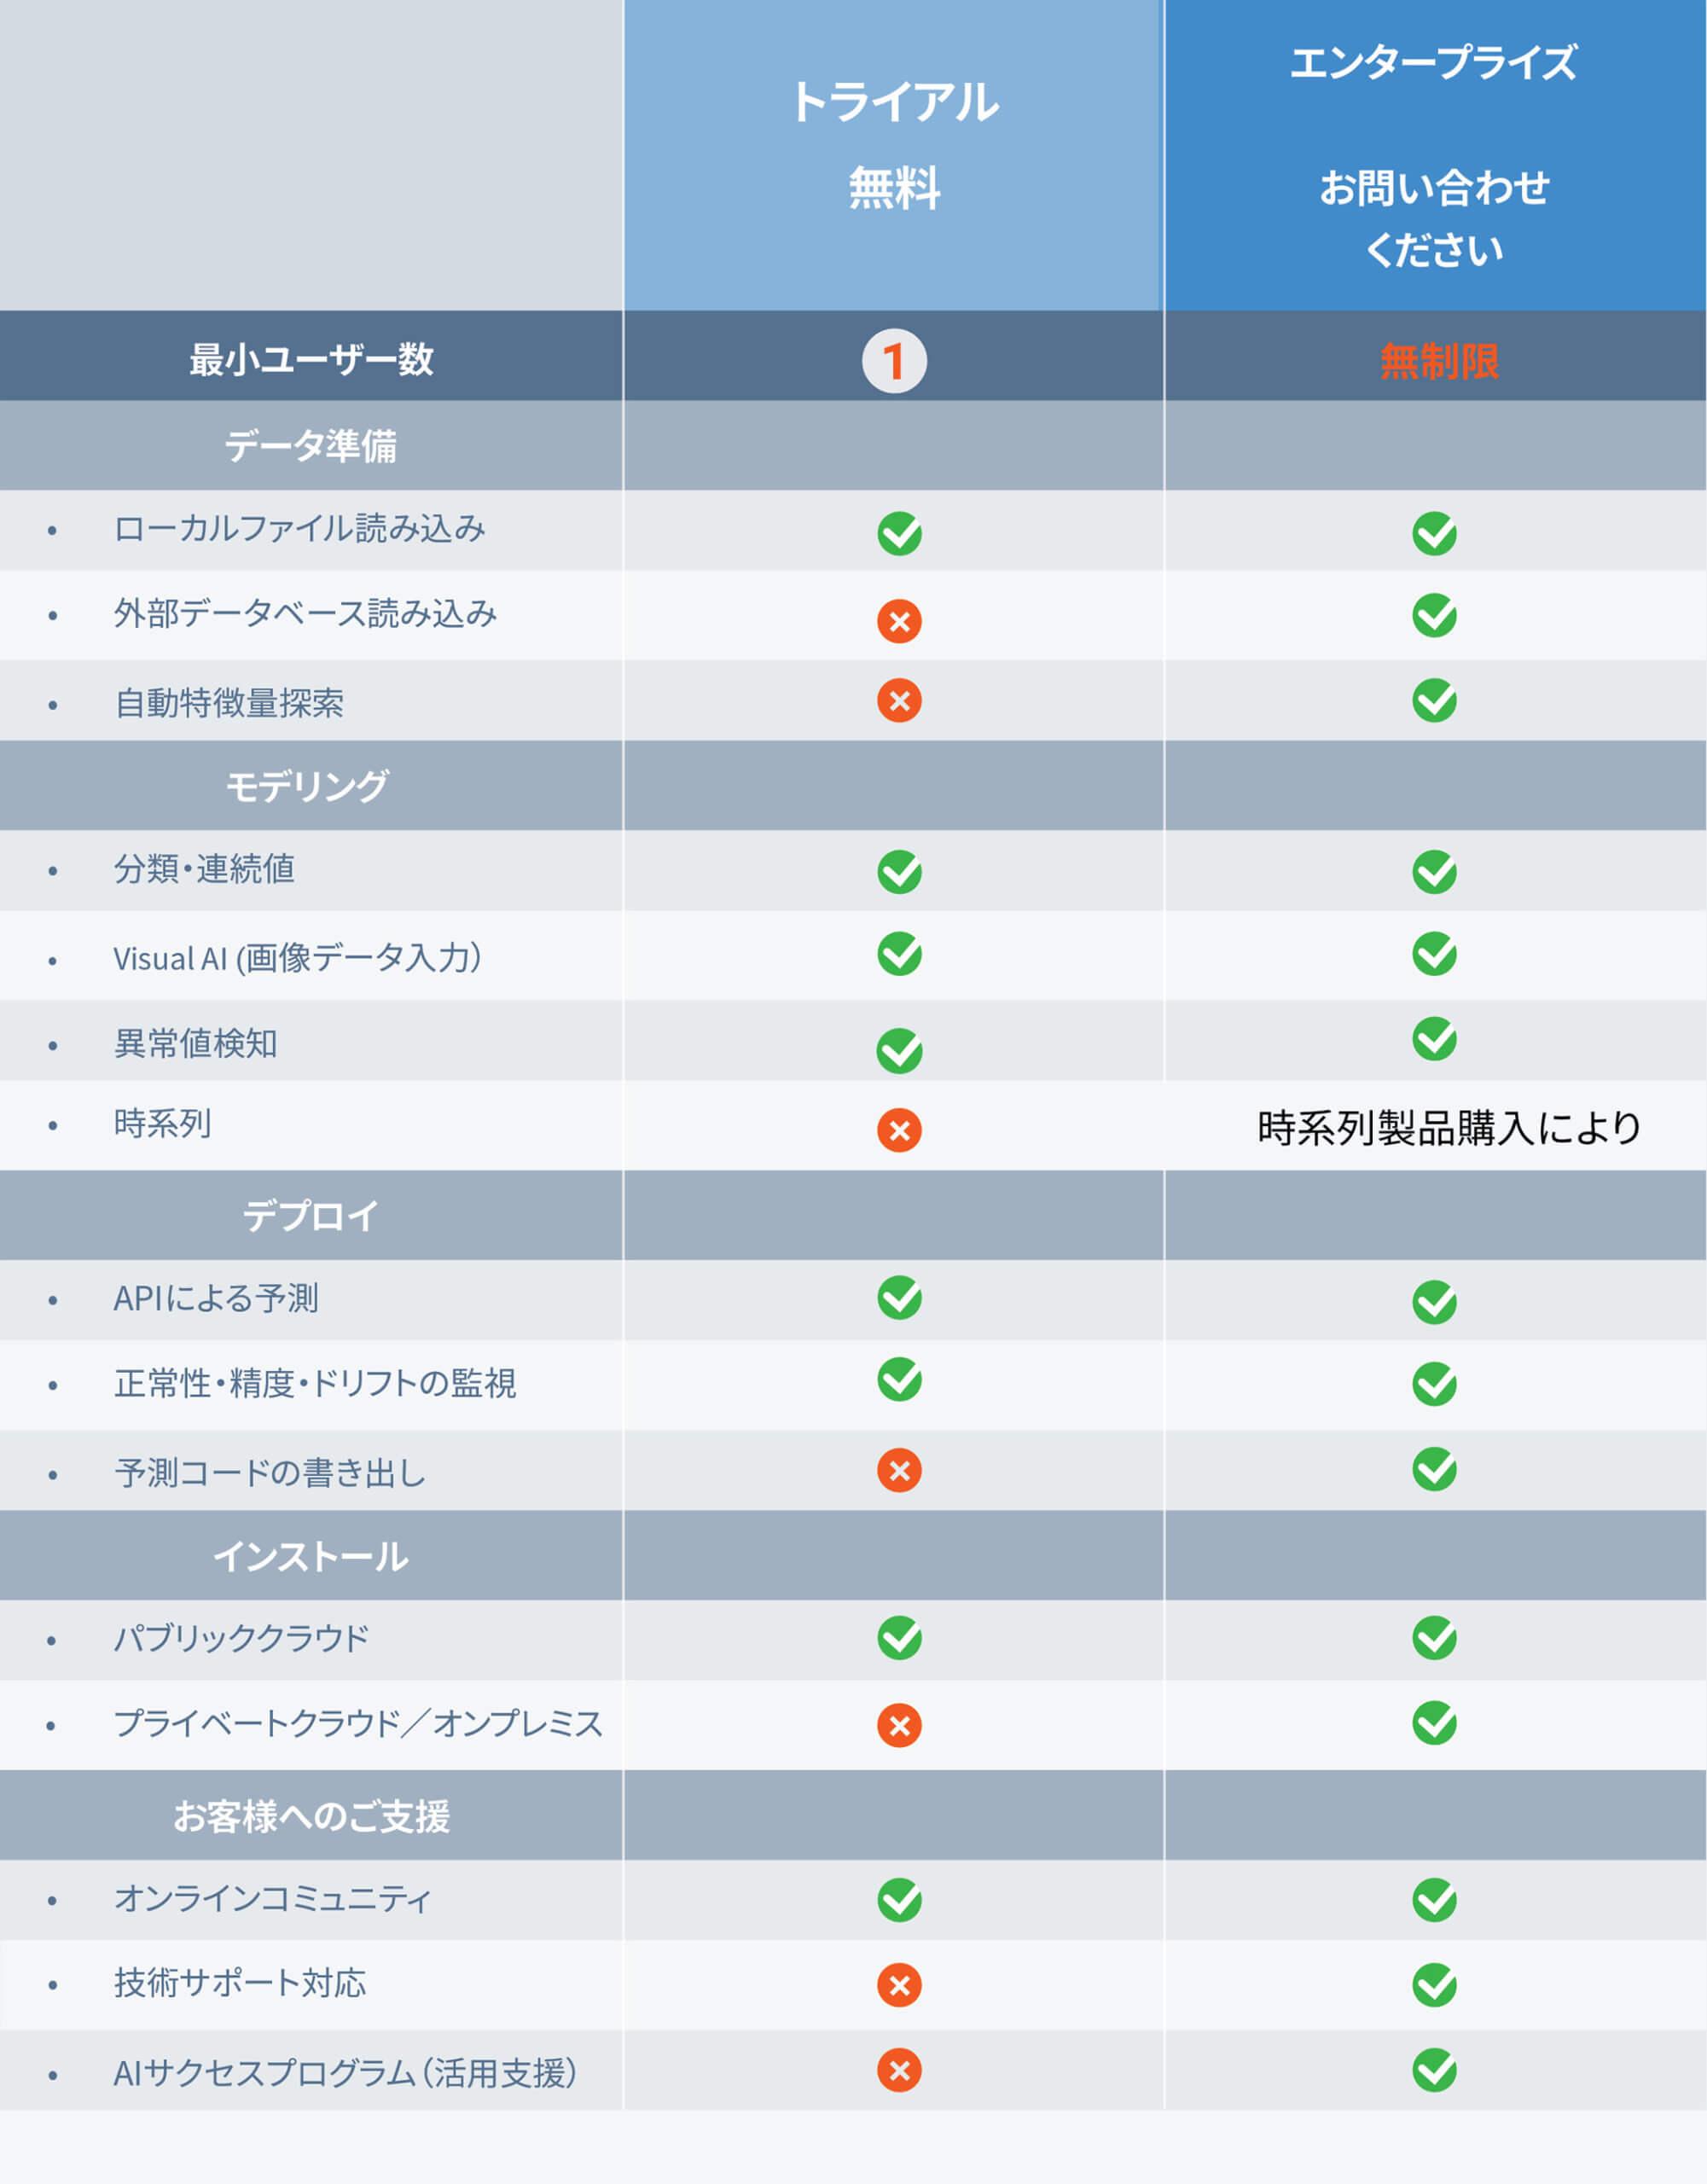 DataRobot JP free trial table v.4.0